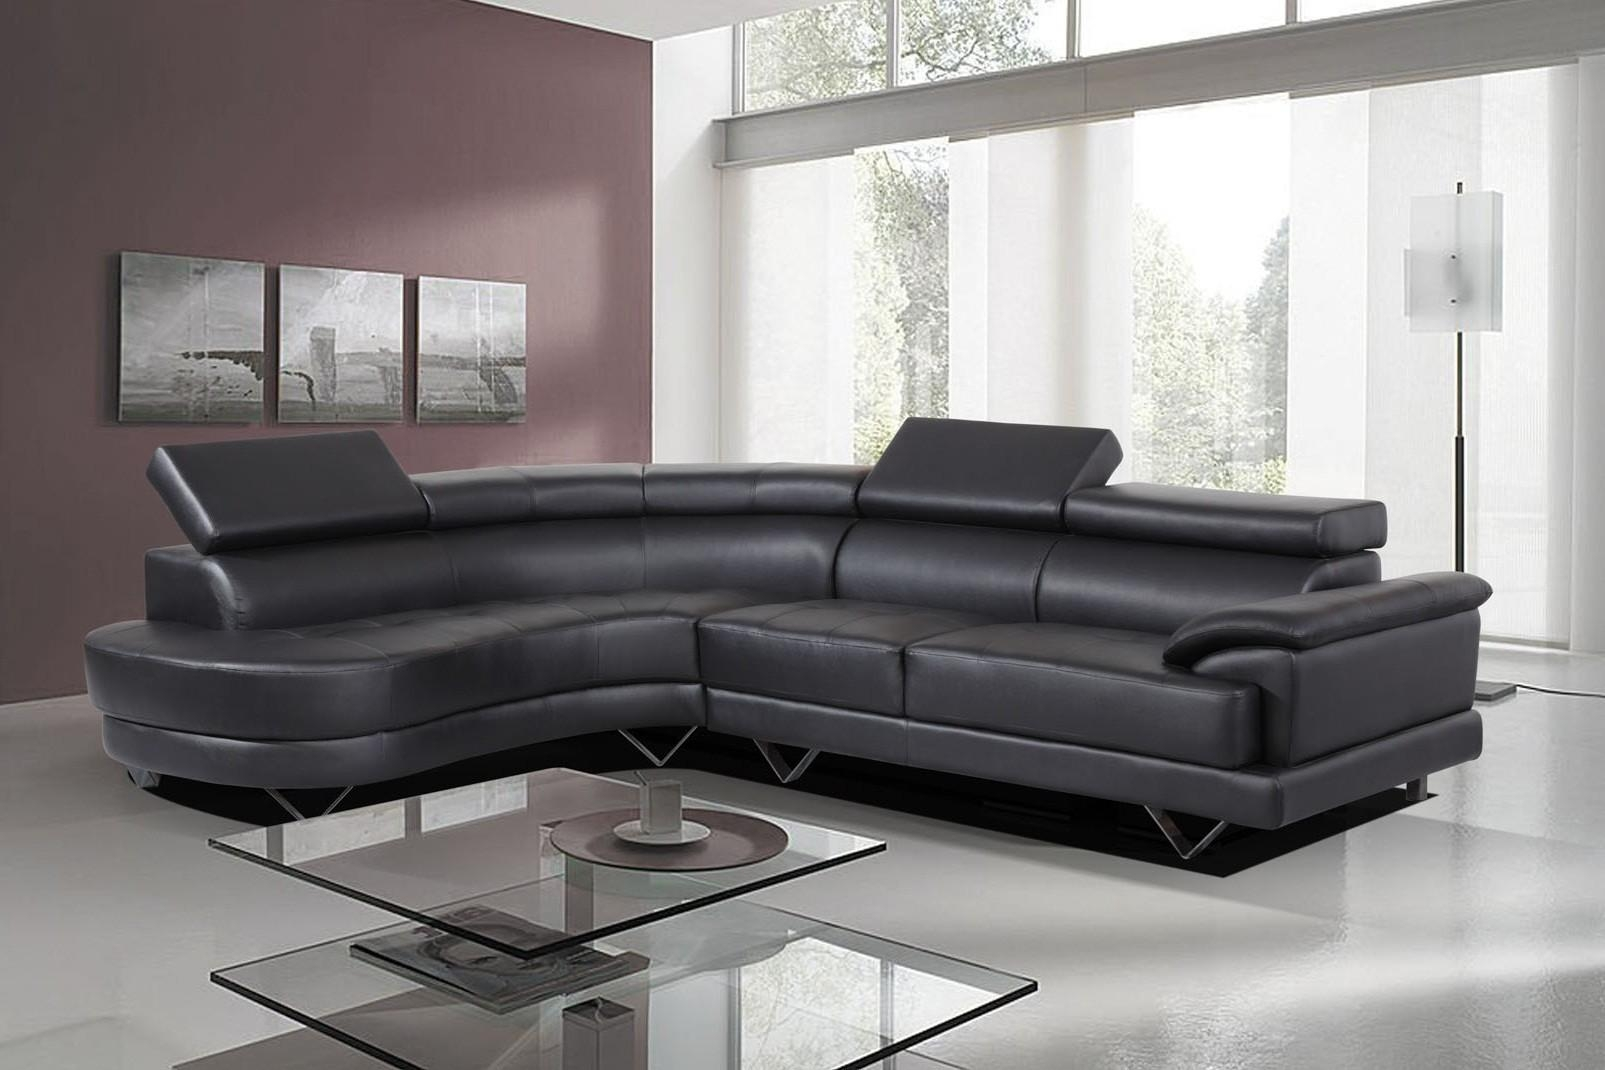 Leather Sofa At Isofas | Latest Designer Leather Sofas Inside White Leather Corner Sofa (Image 11 of 20)